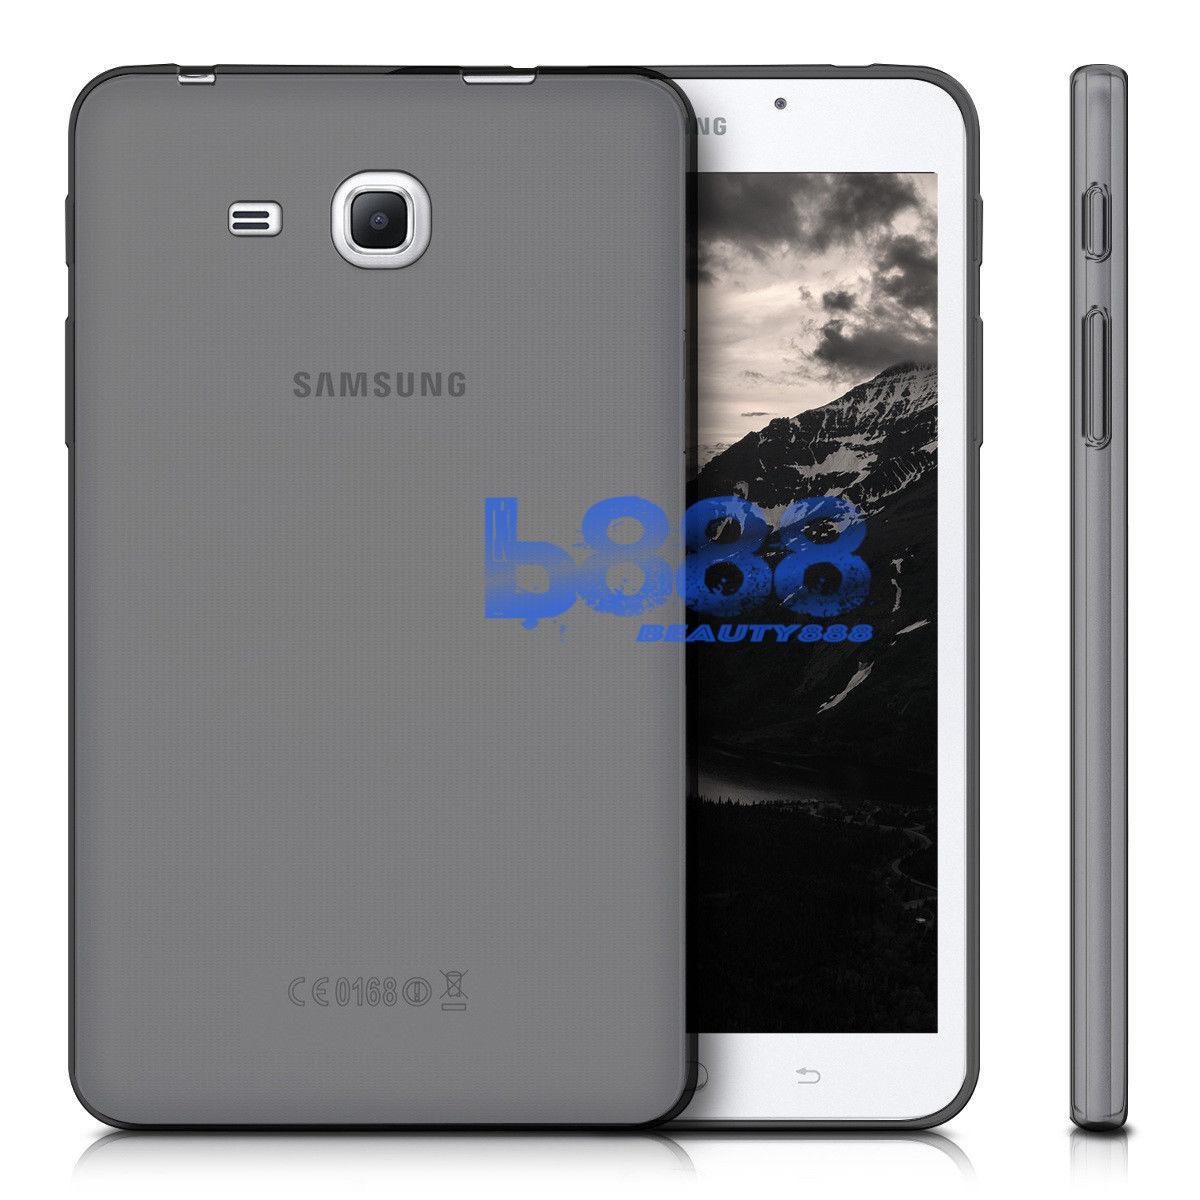 Beauty Case Samsung Galaxy Tab A 2016 T280 T285 Ukuran 7.0 inch Ultrathin Elegant Softcase Anti Jamur / Jelly Case Samsung Tab A 2016 T280 T285 / Ultrathin Samsung Tab T285 T280 7.0 inch / SIlicone Case / Casing Samsung Tab - Hitam Transparant